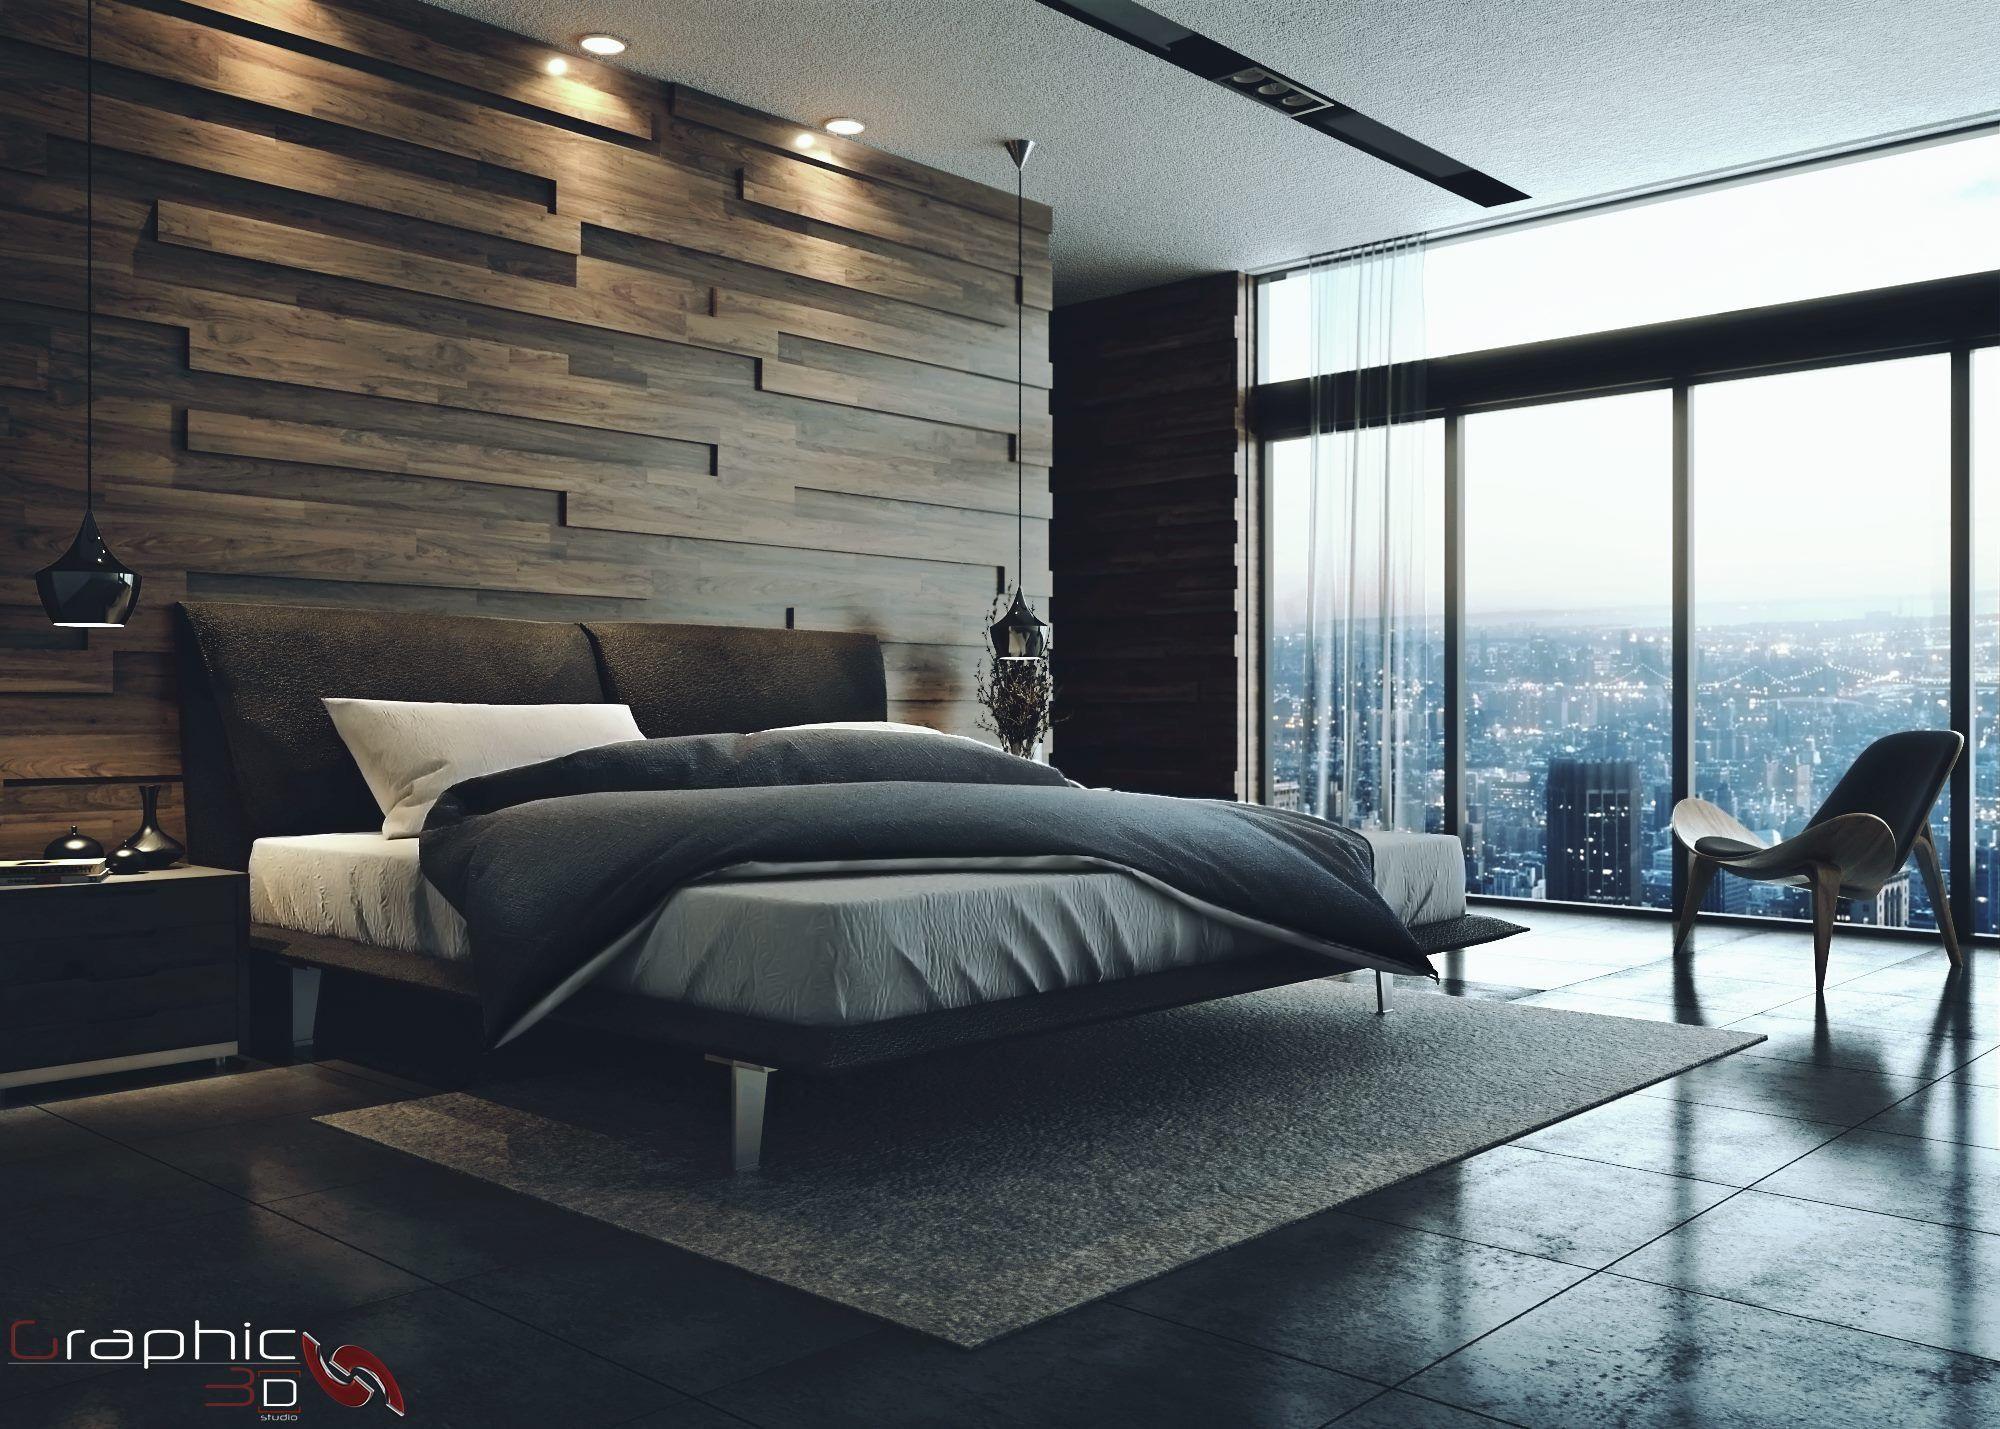 Bedroom Modern Designs 4A945190F91820A27E27618D6F14A872 2 000×1 429 Пікс Home